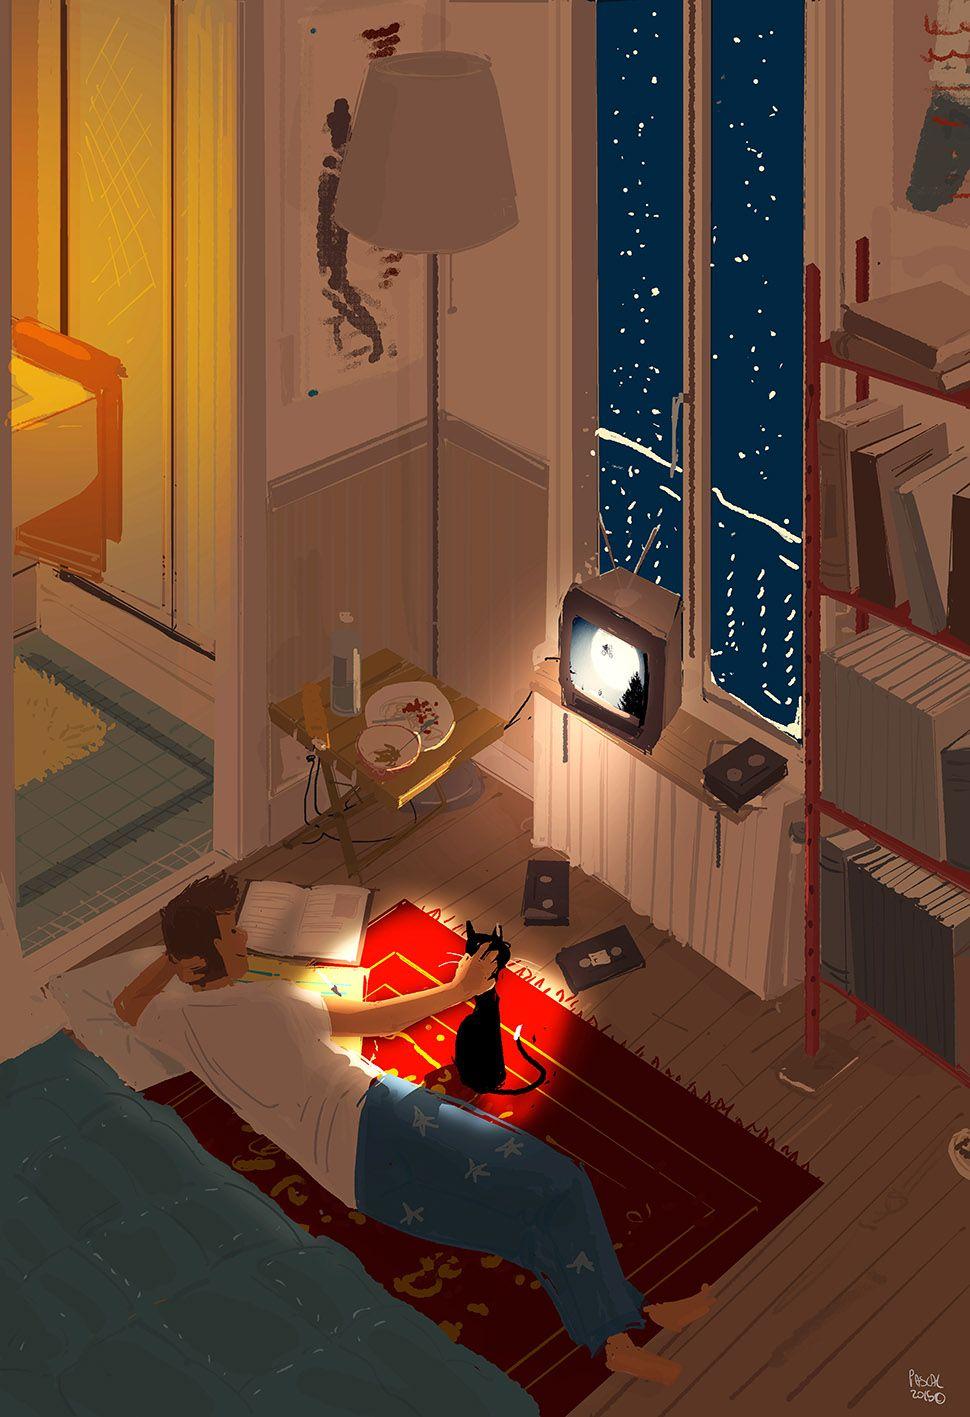 Movie night. by PascalCampion.deviantart.com on @DeviantArt